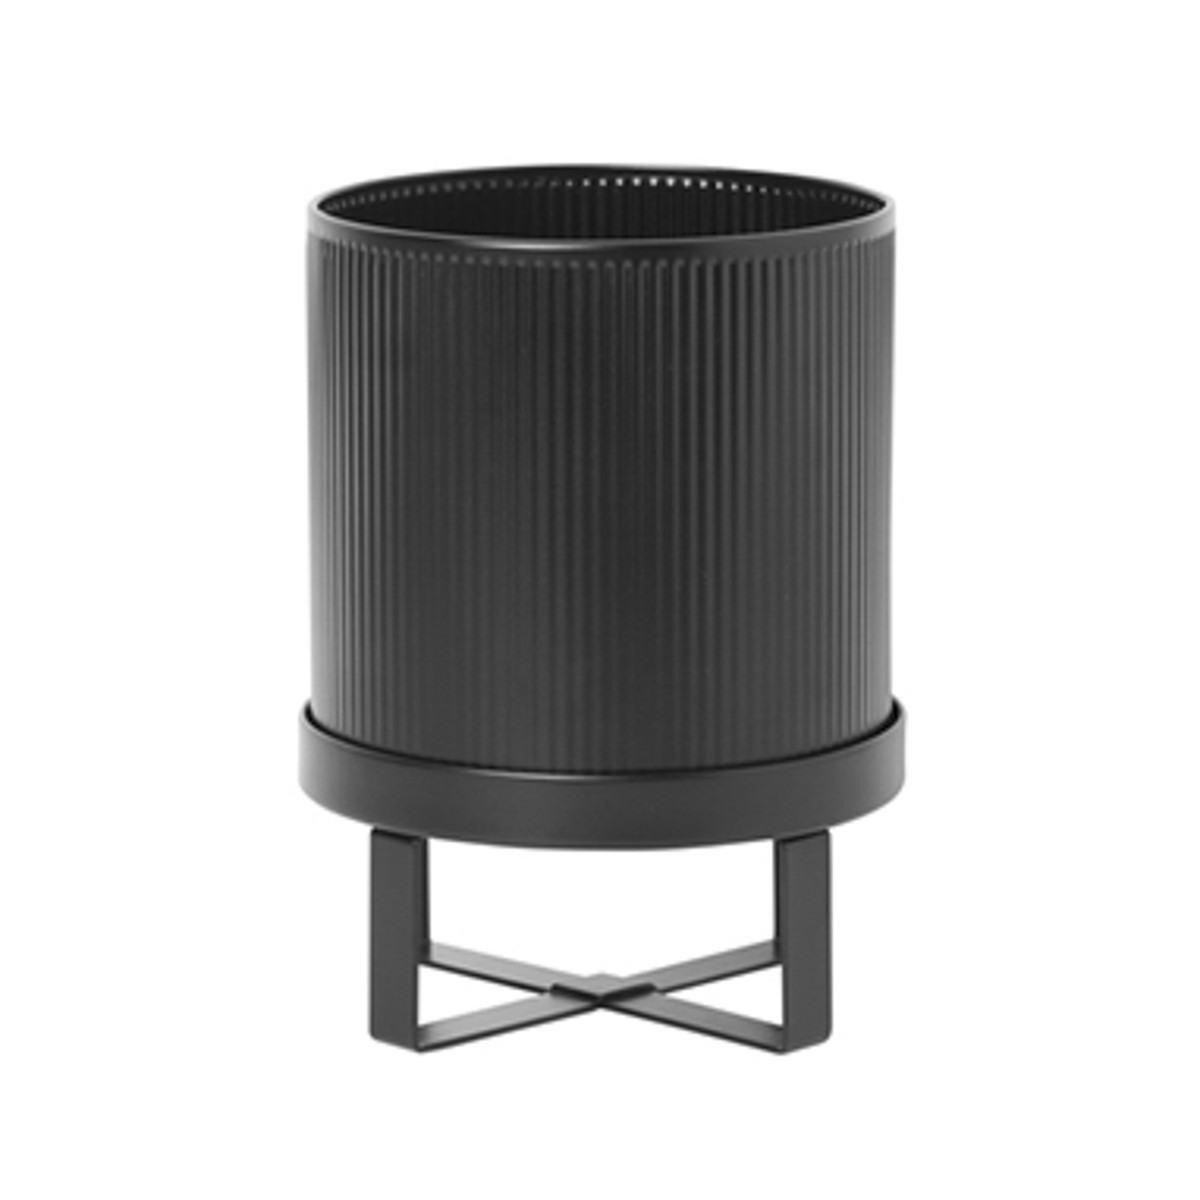 Ferm Living Bau Pot - Small-Black